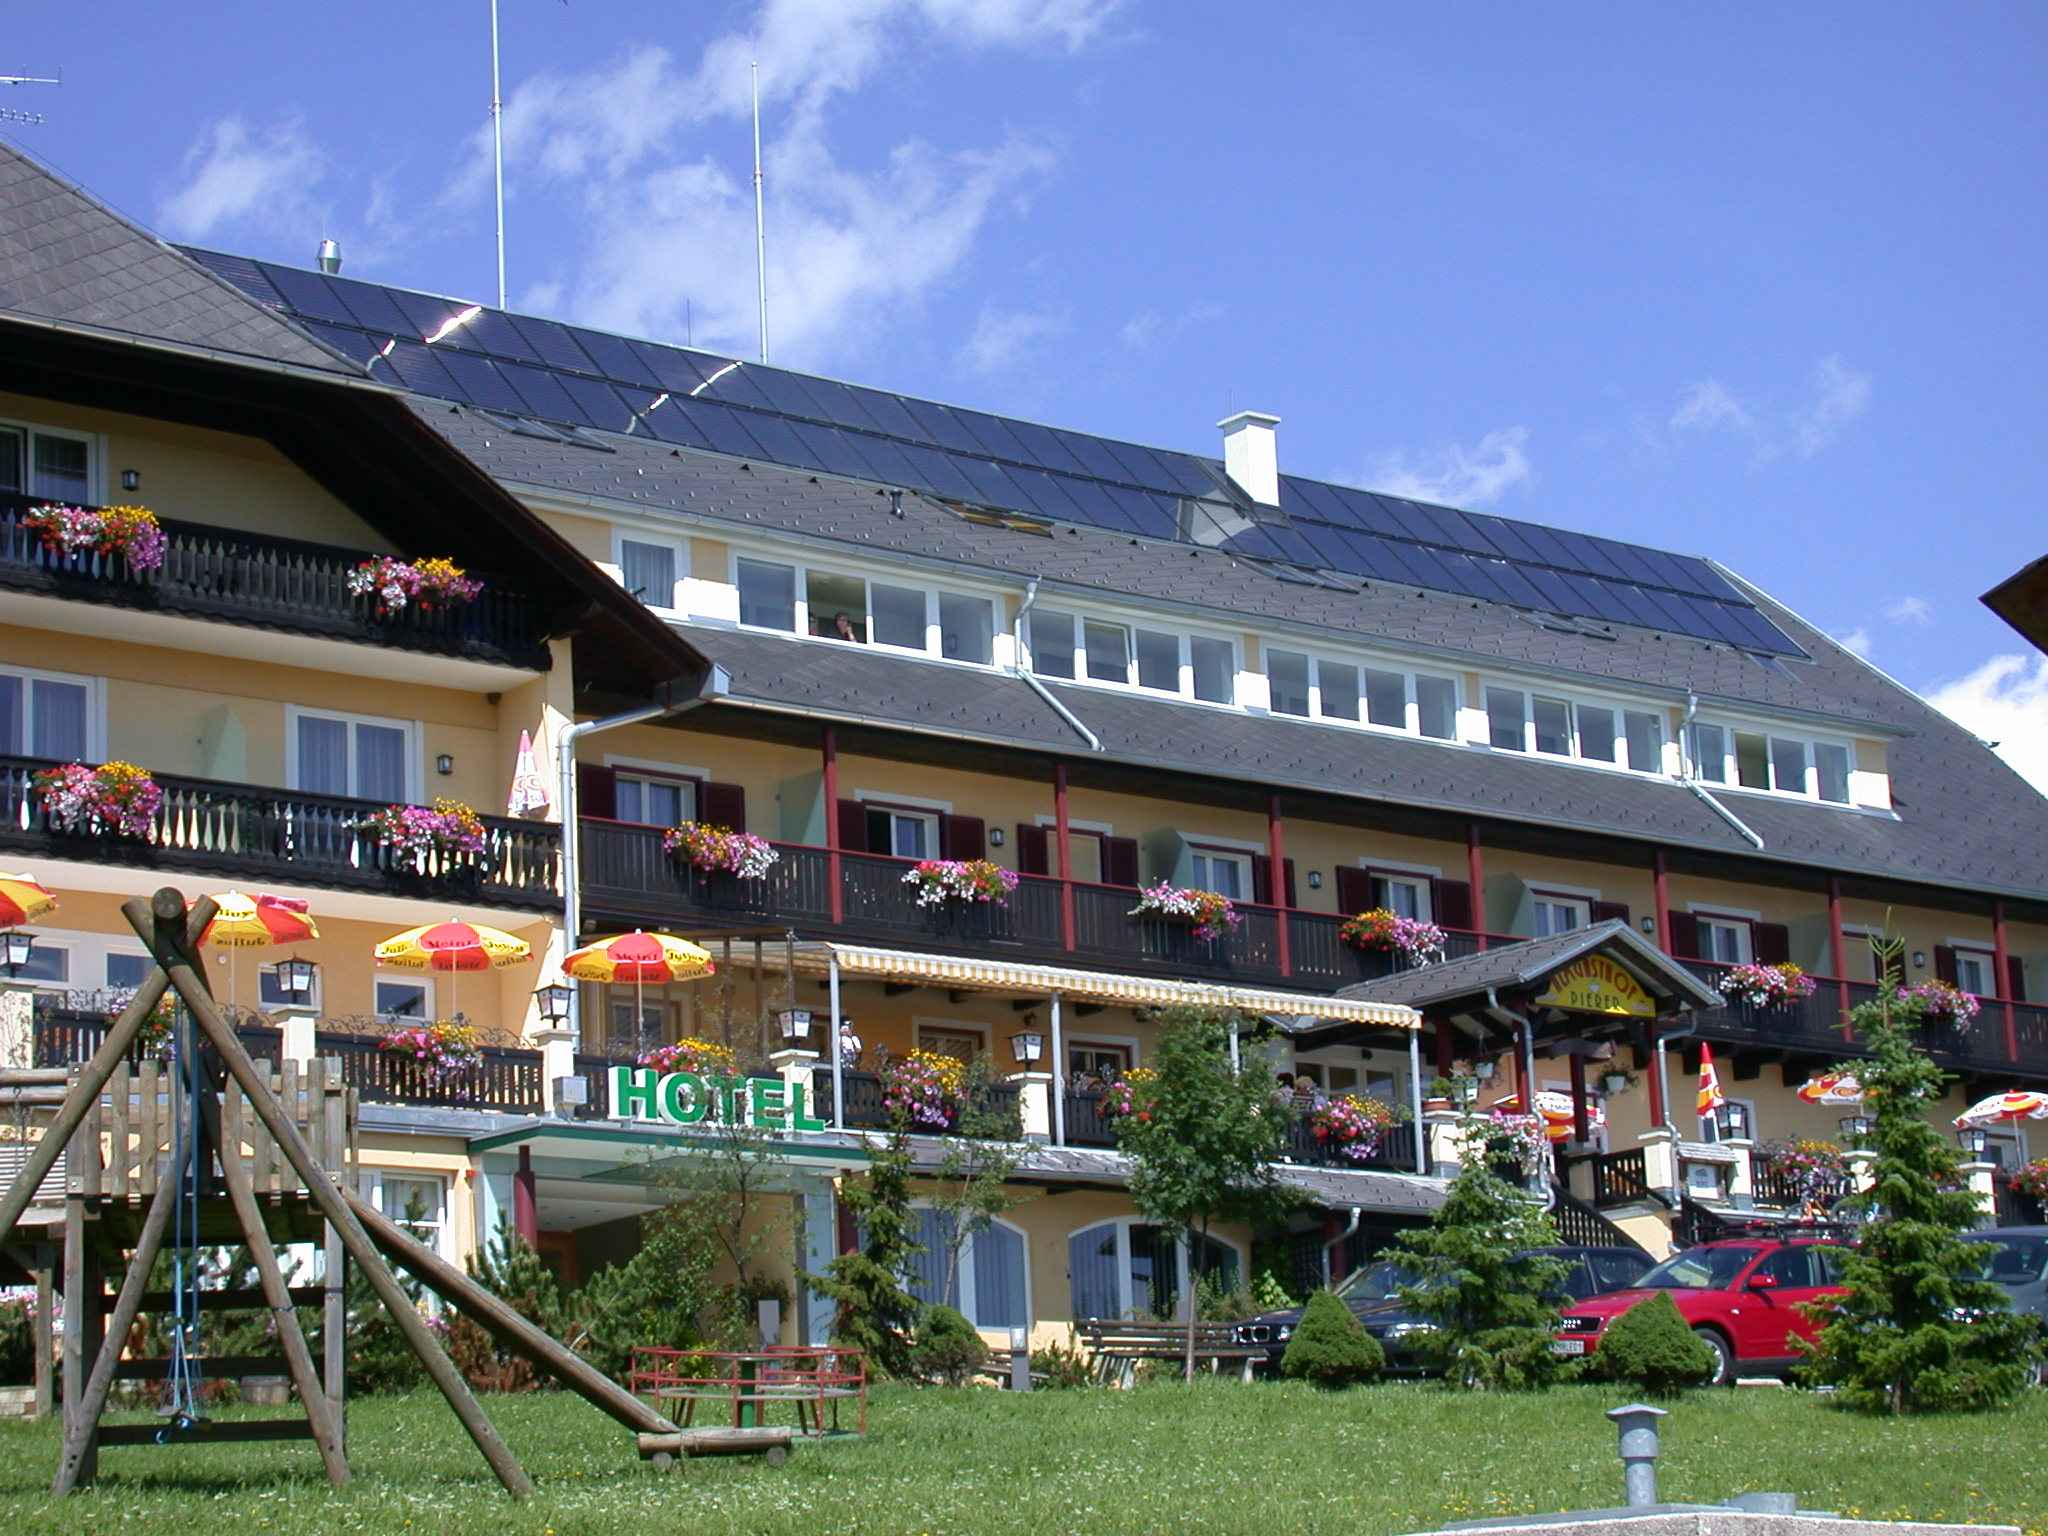 Austria Solar Solar Heat Europe – Hotel in Austria – V3